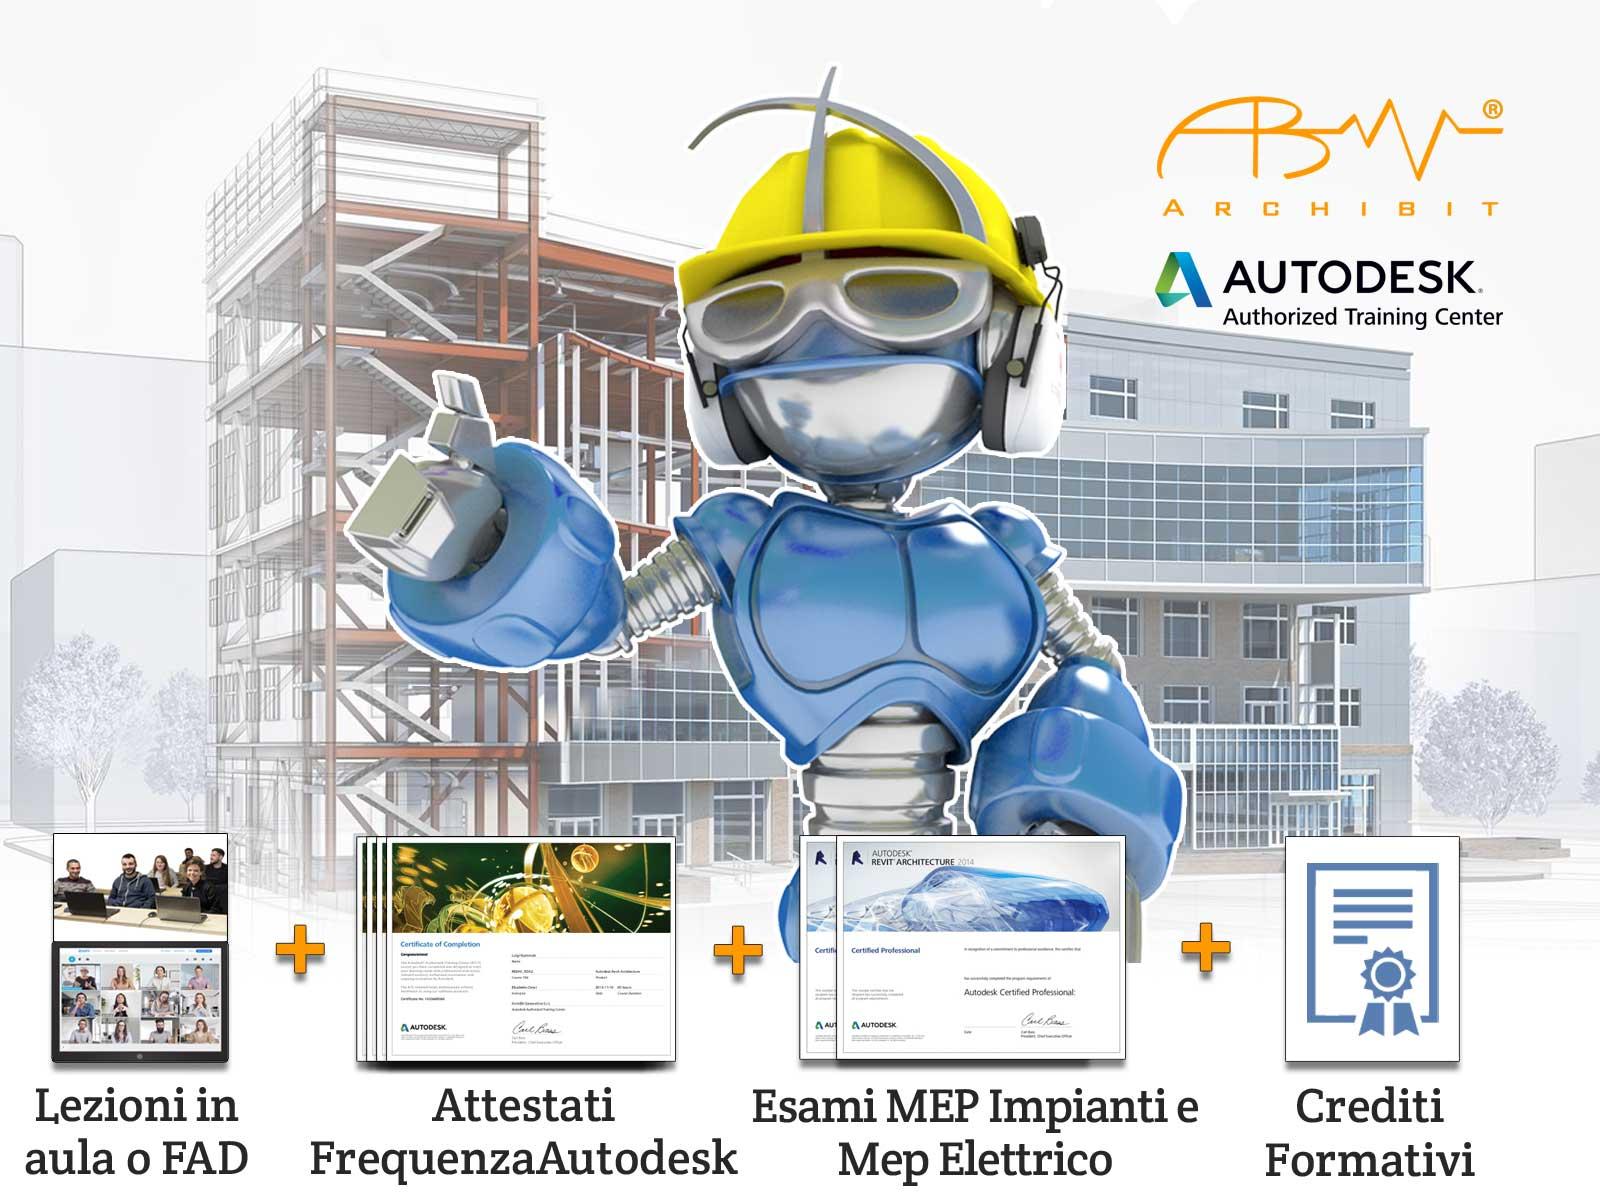 revit bim expert corso bim con certificazioni autodesk